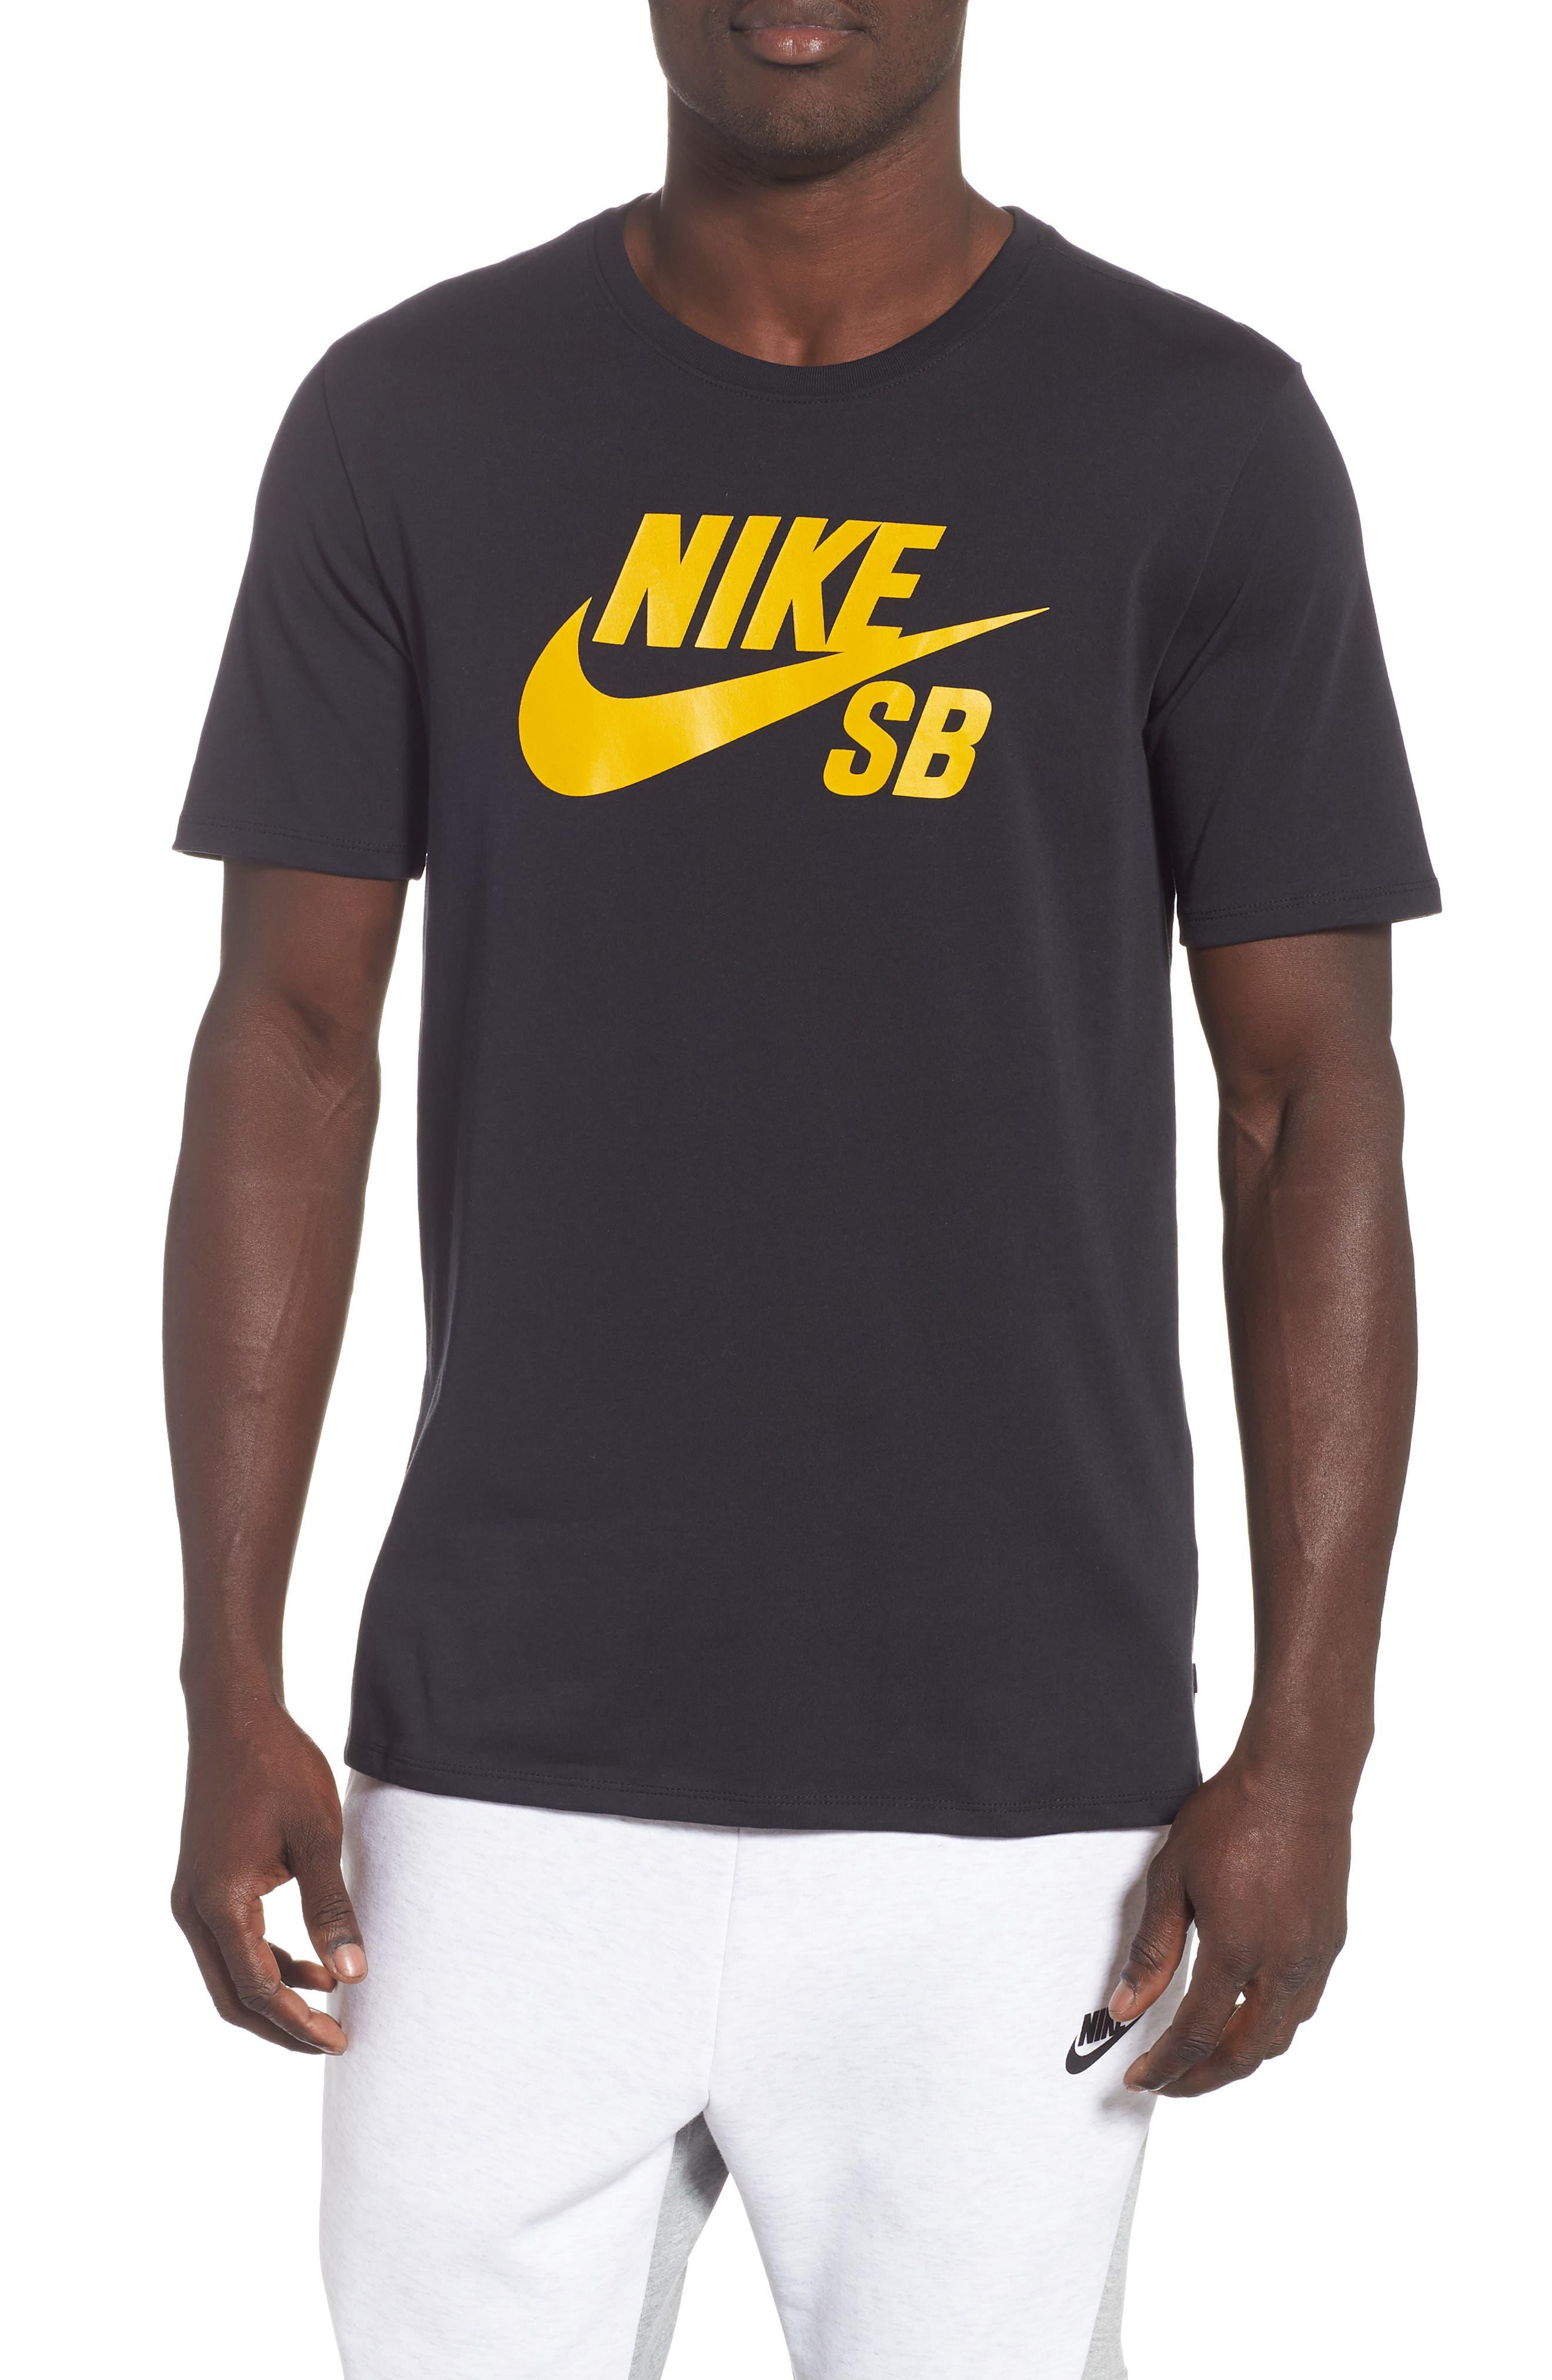 Nike 'SB Logo' T-Shirt, Main, color, BLACK/ YELLOW/ OCHRE